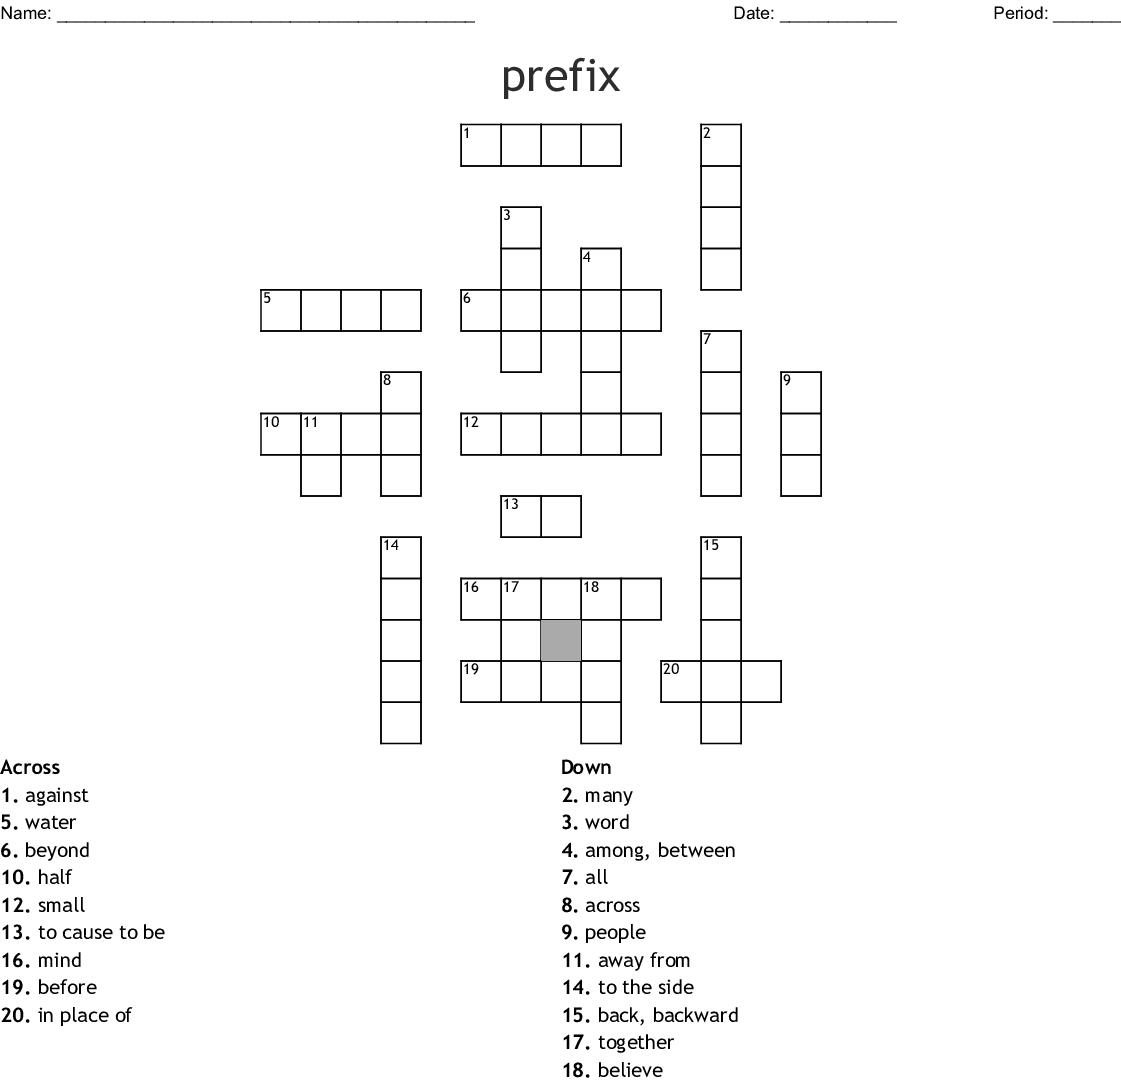 Greek And Latin Prefixes And Affixes Crossword